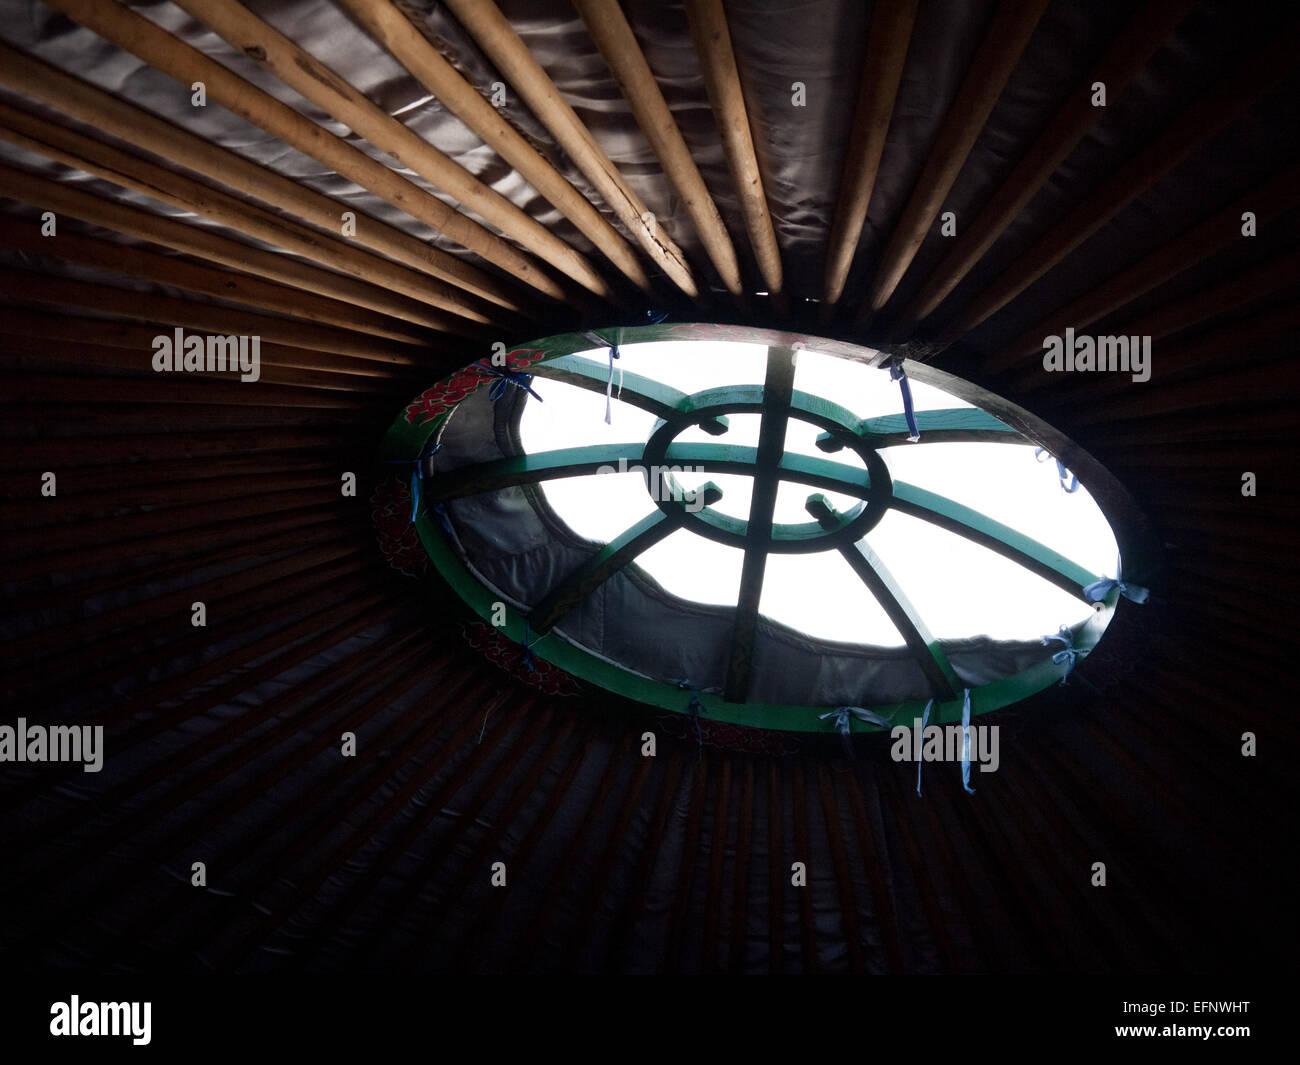 Mongolian Yurt, tent, Llangollen, Wales, United Kingdom Stock Photo